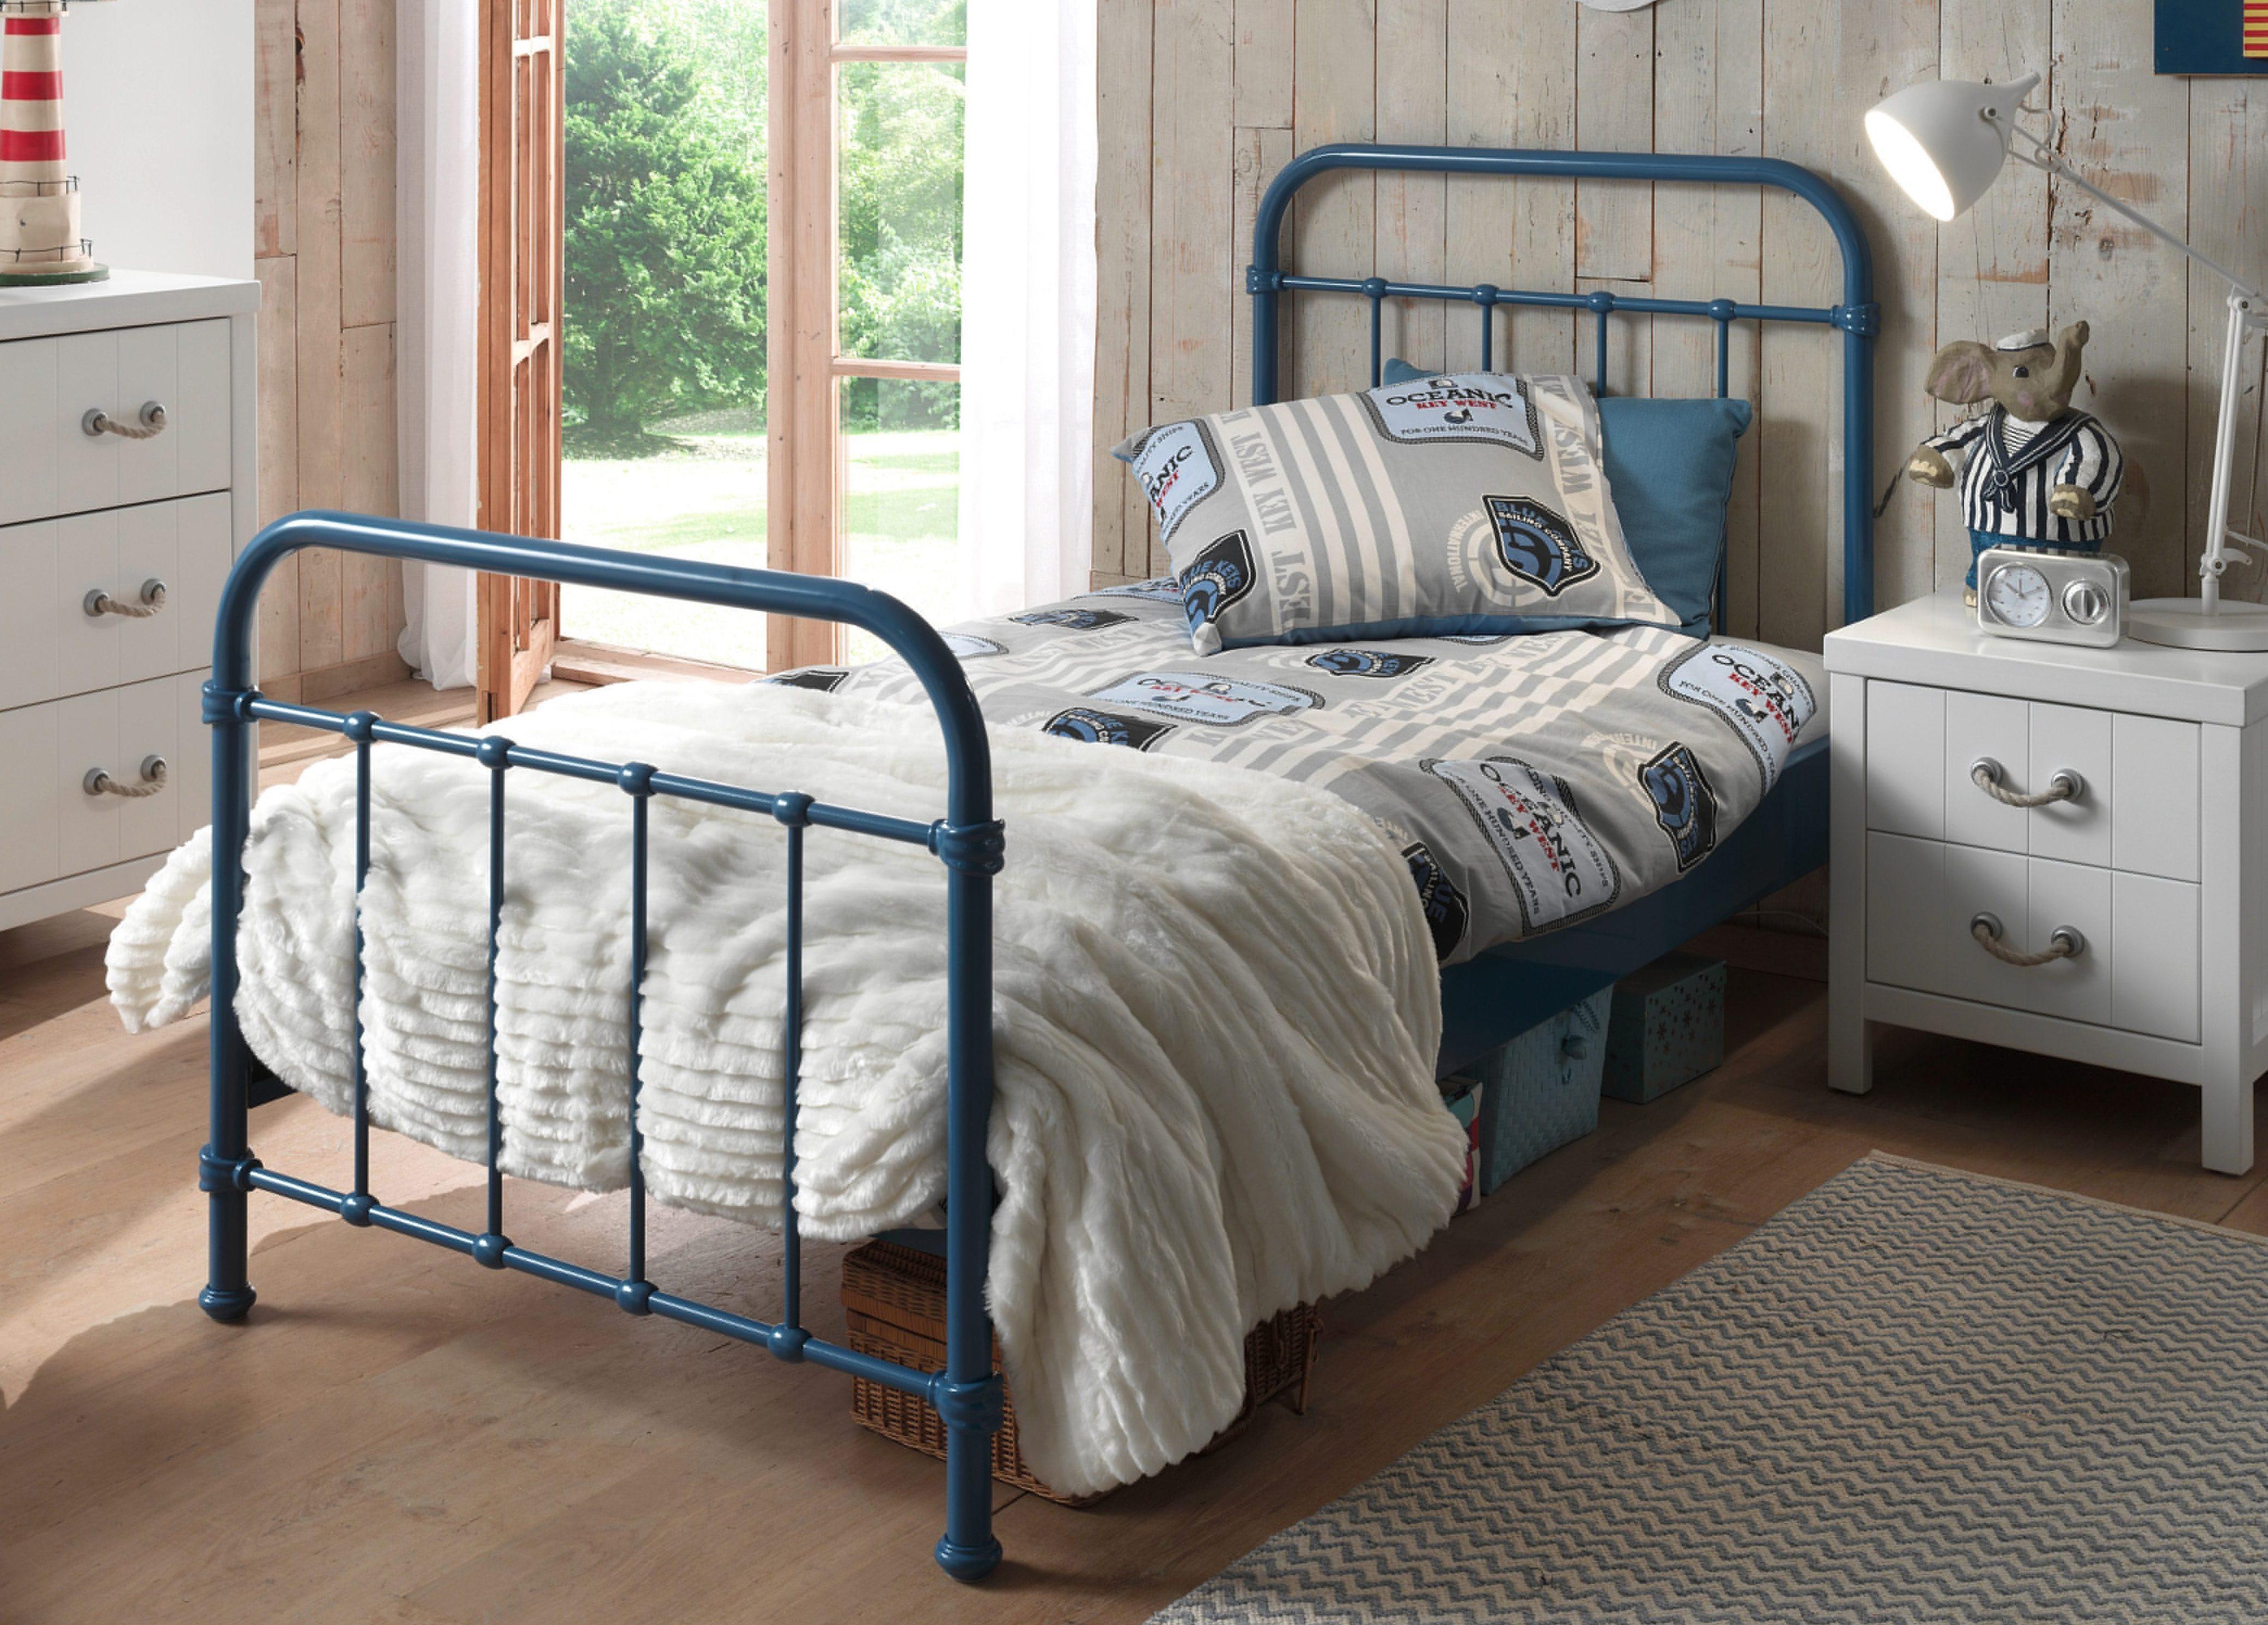 Vipack, Metallbett | Kinderzimmer > Kinderbetten > Kinderbetten | Pulverbeschichtet | VIPACK FURNITURE